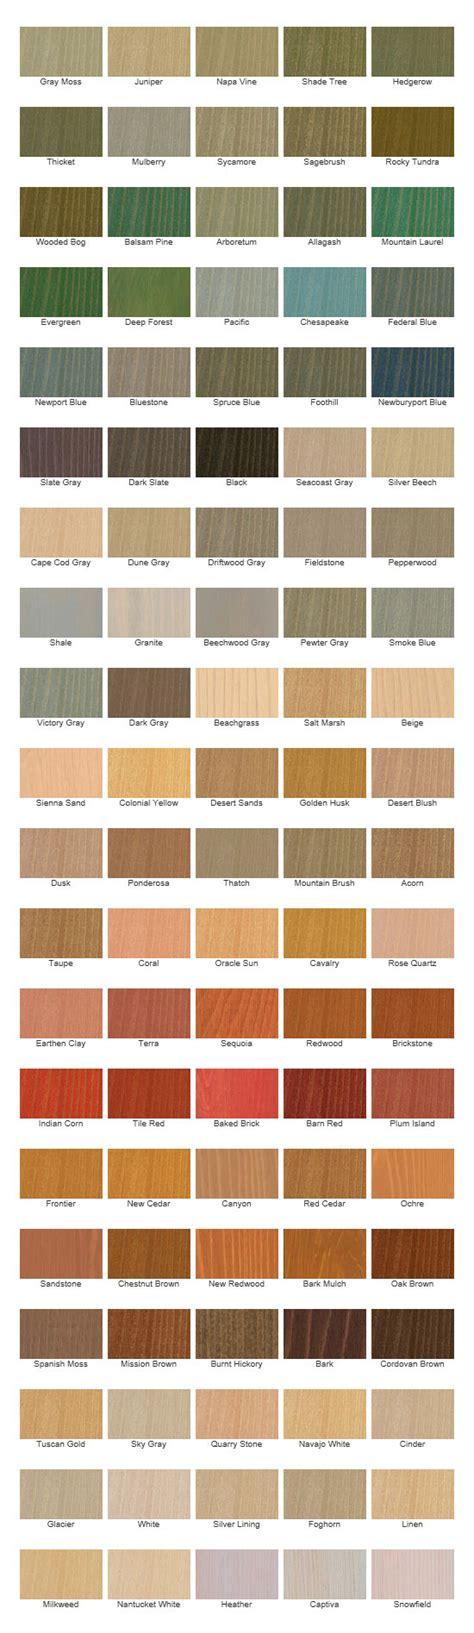 beauti tone color wheel colour finder screenshot